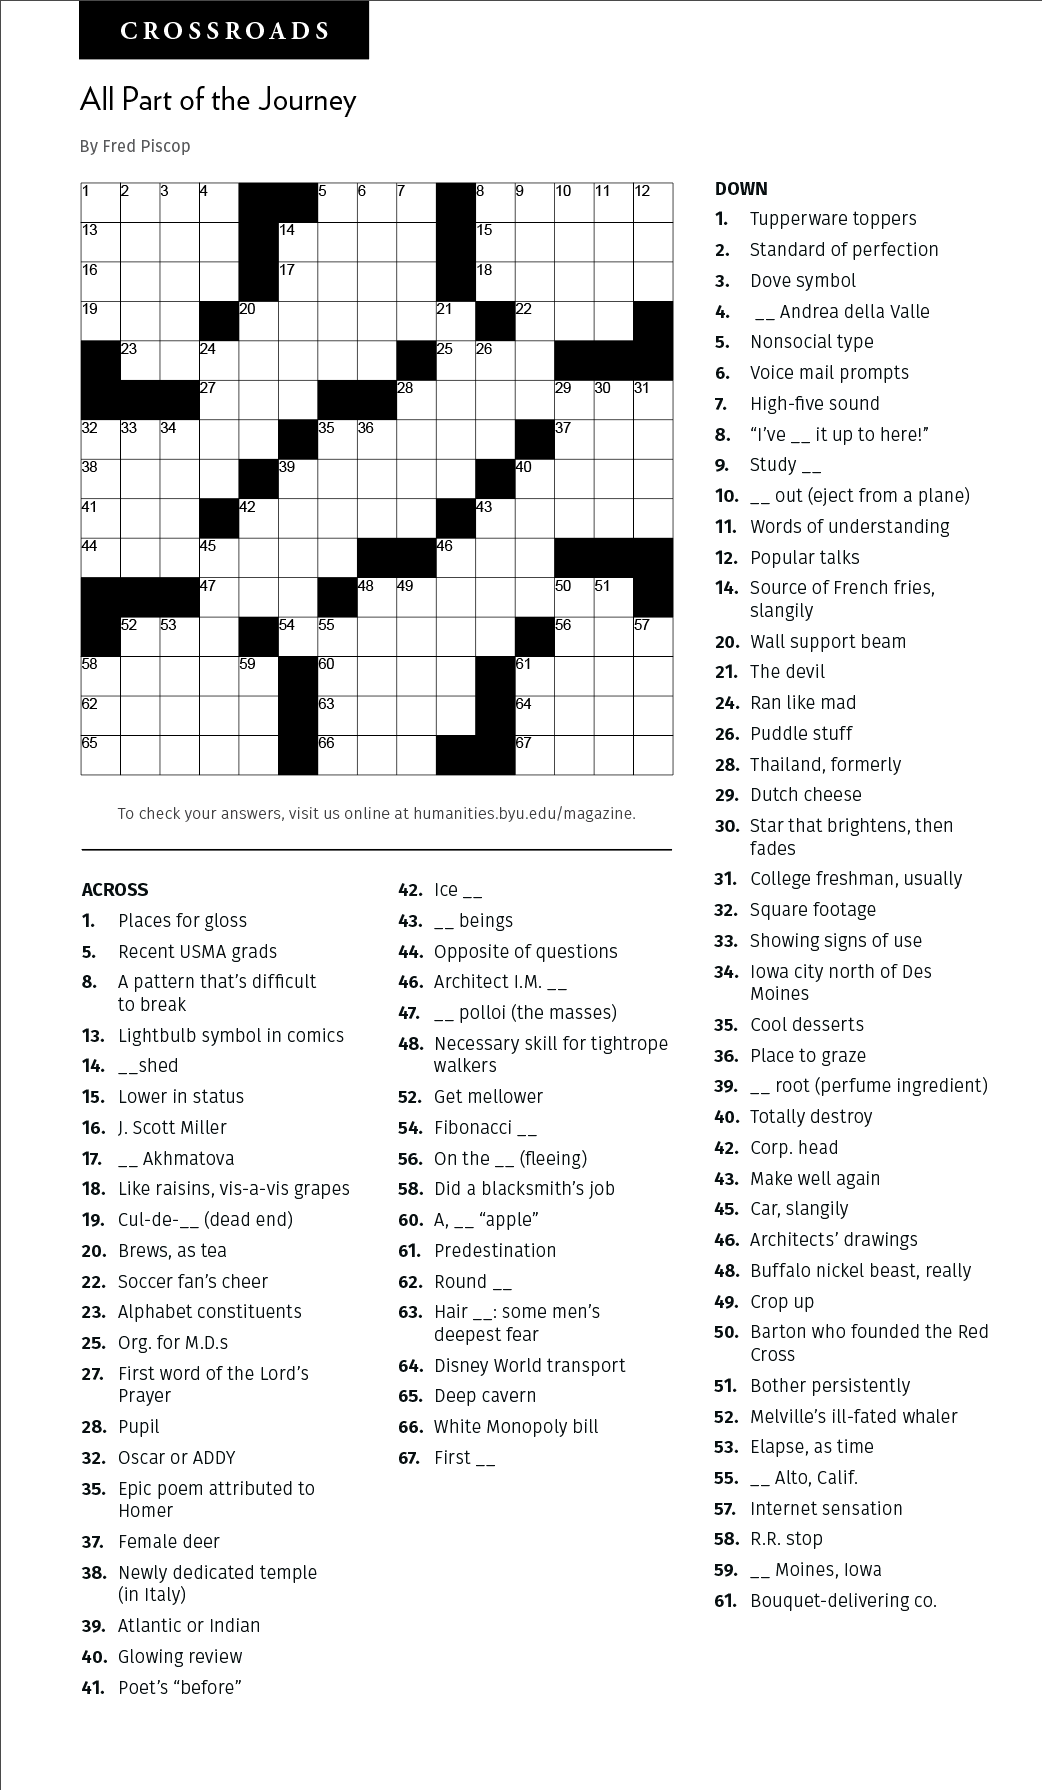 Fall Magazine Crossword Puzzle